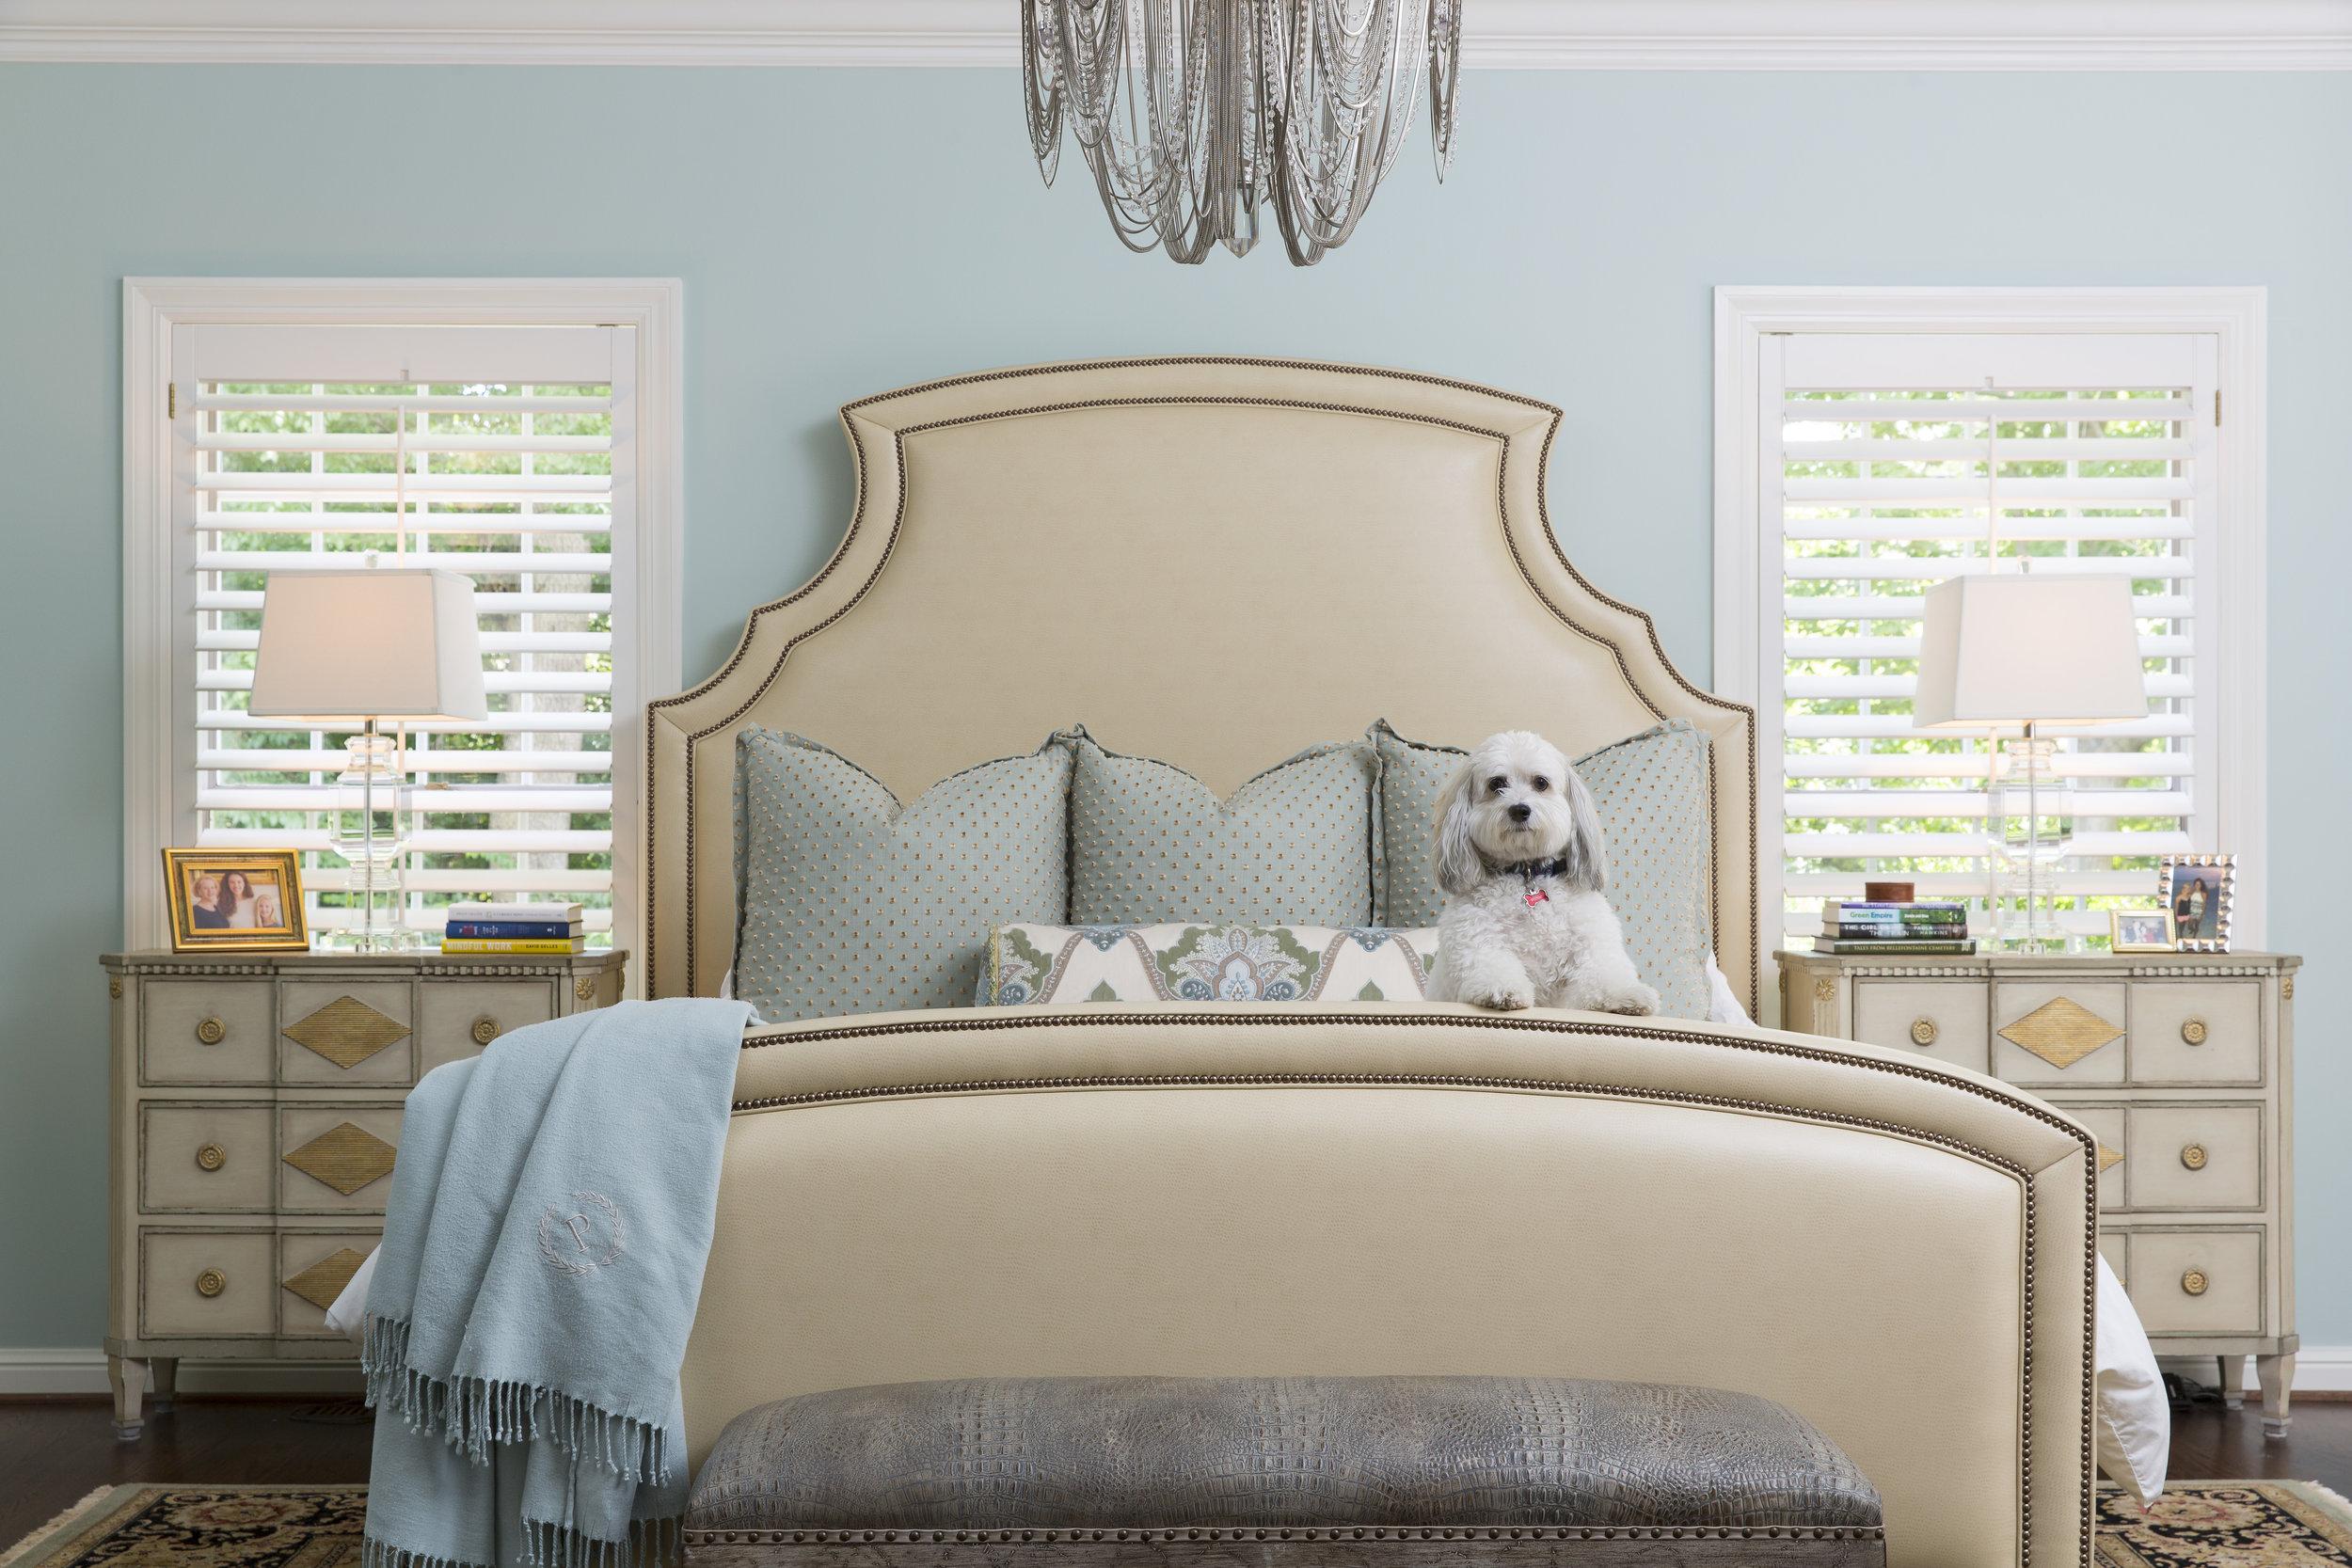 Insite-Interiors-St.Louis-Bedroom.jpg